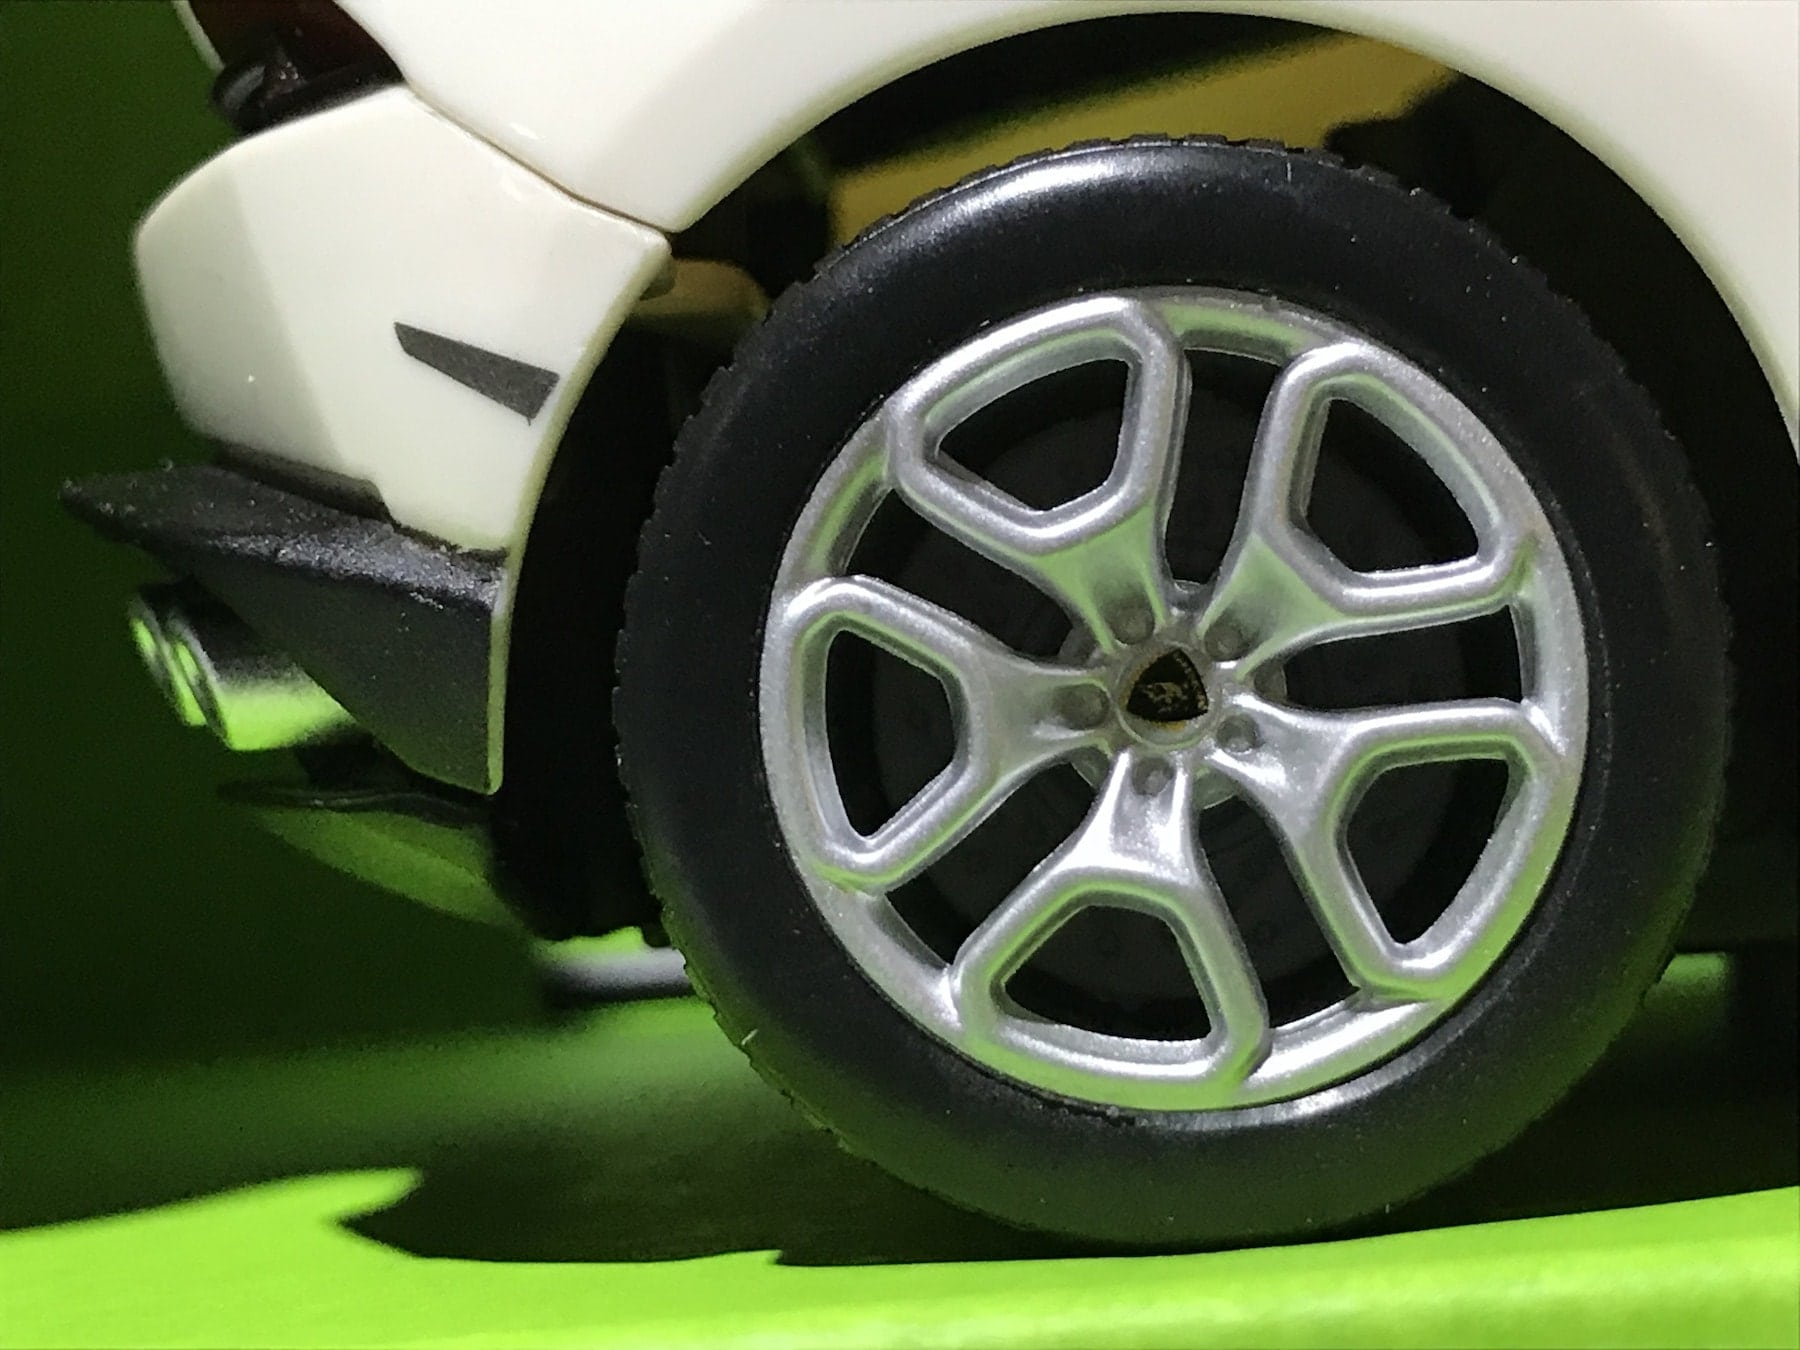 Lamborghini Huracan 1:24 RC Radio Controlled Scale Model Car Big Boys Toy Christmas Gift Xmas Birthday Present